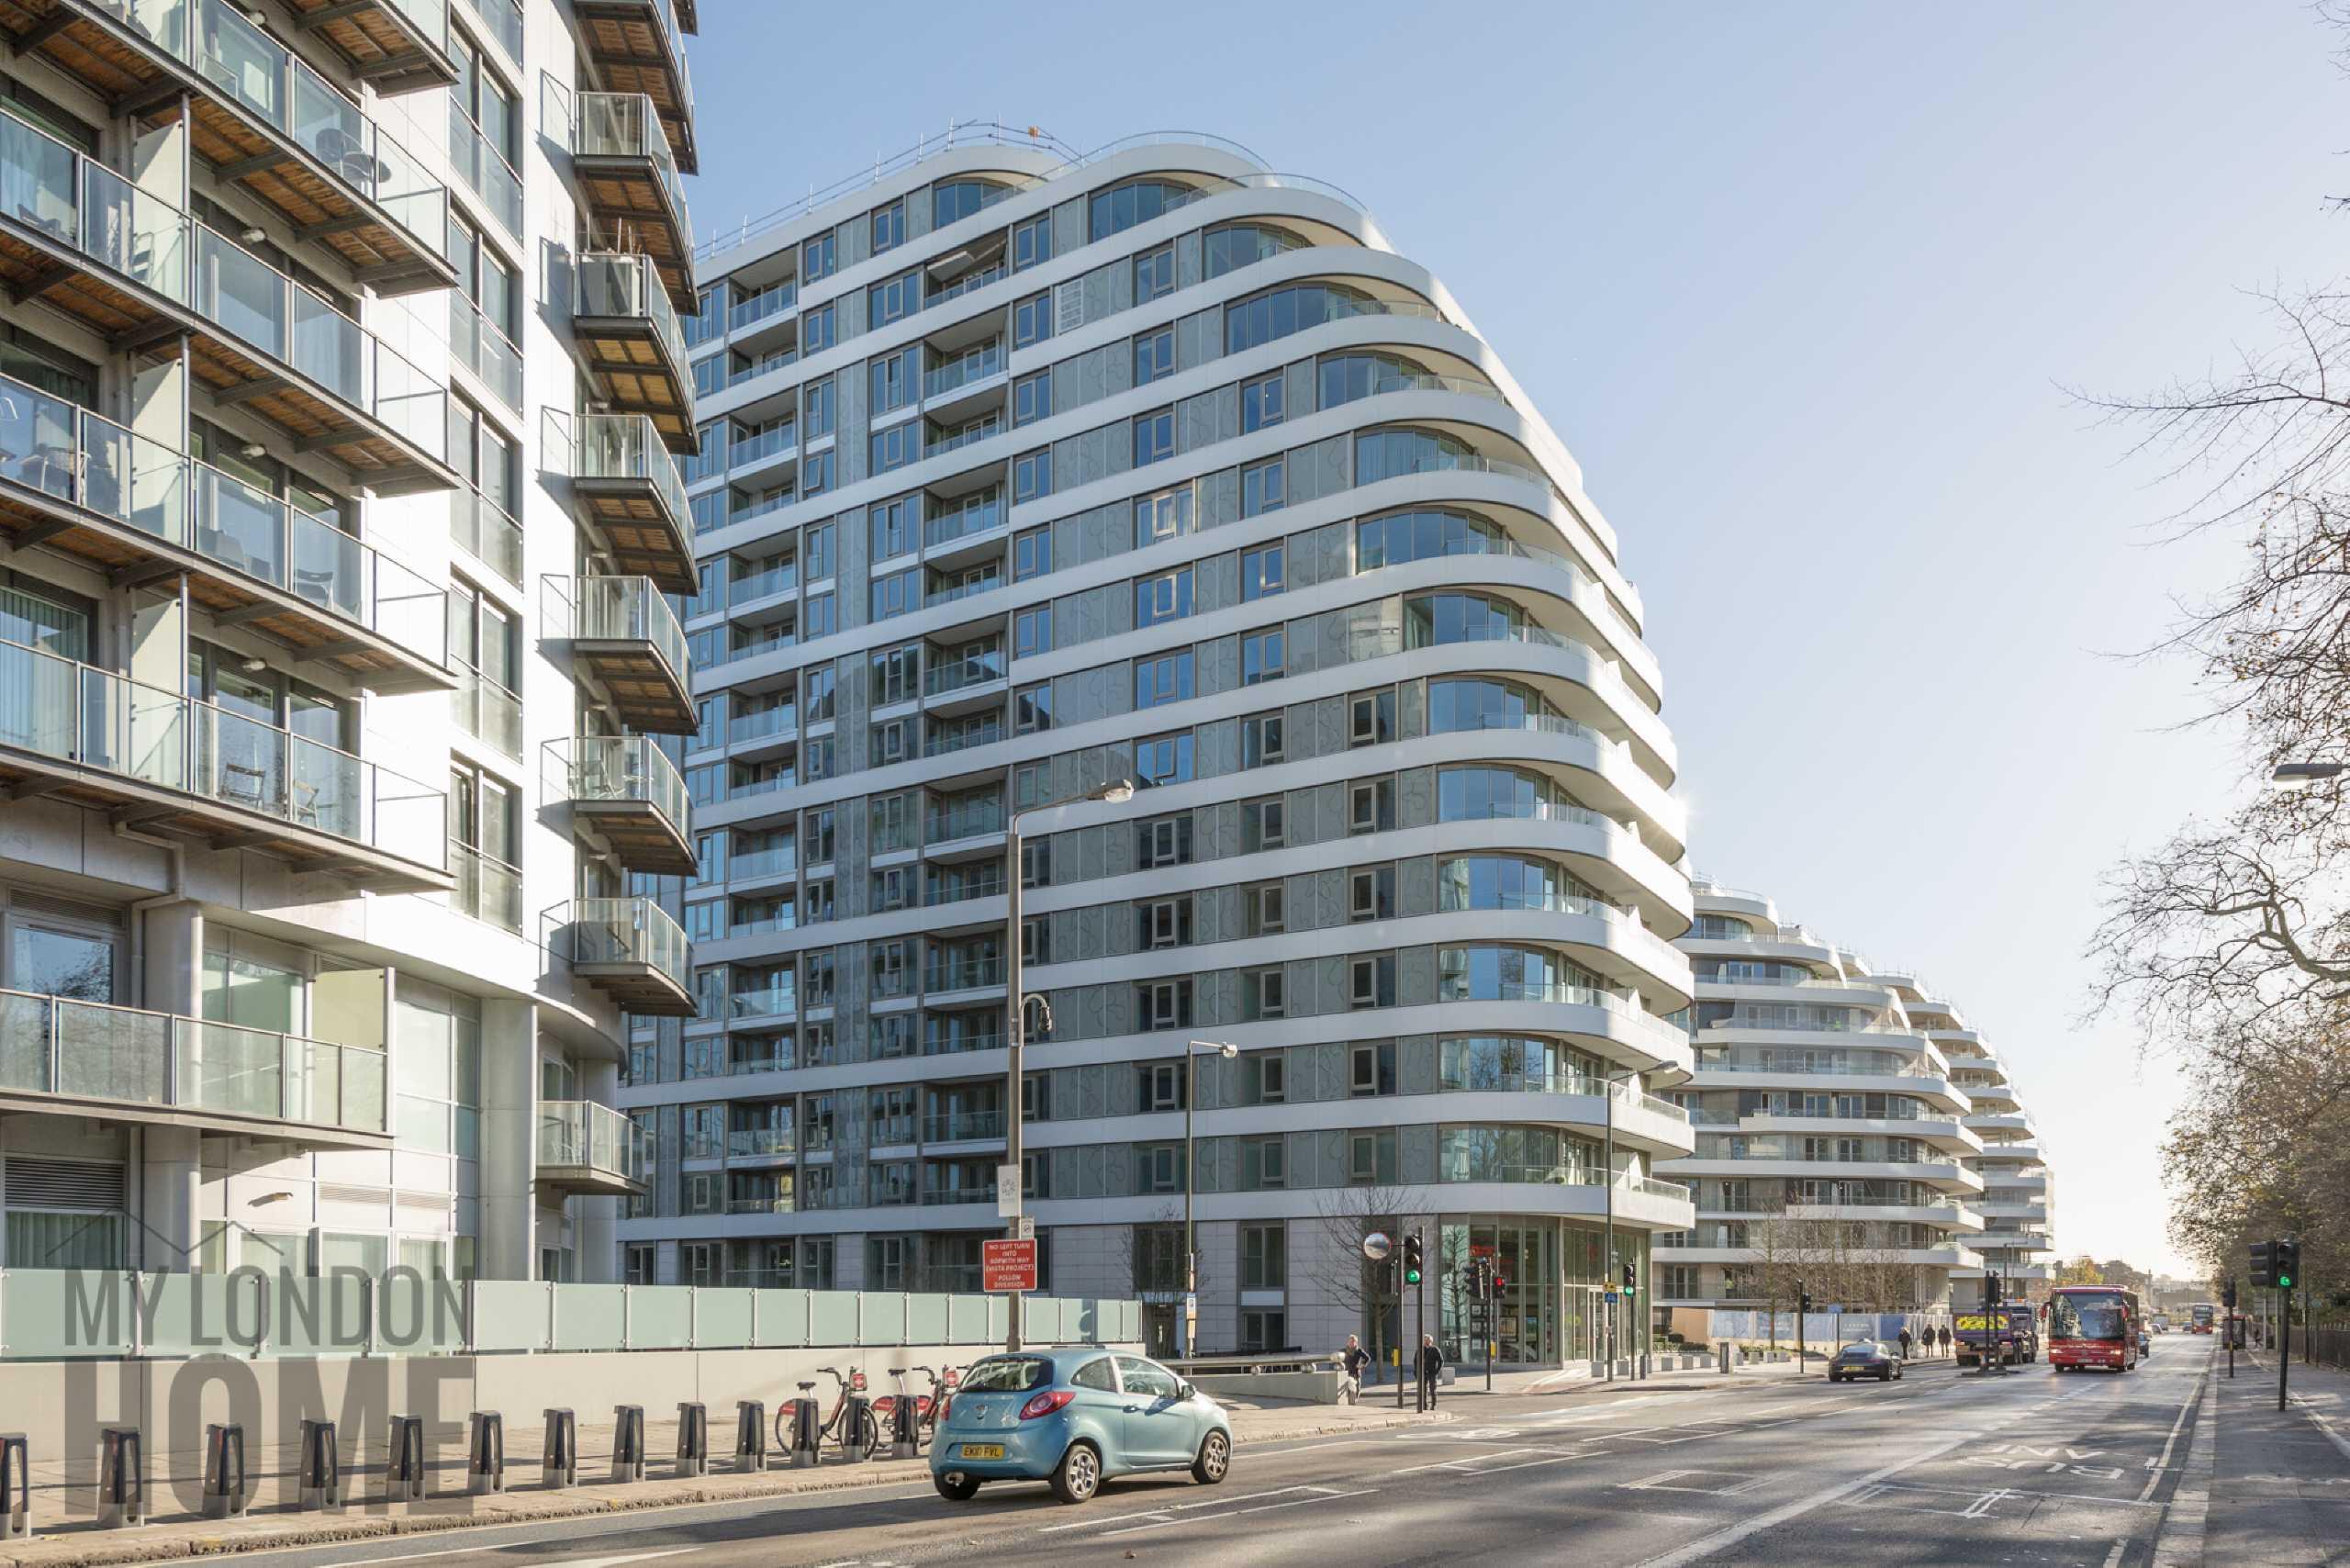 2 Bedrooms Apartment Flat for sale in Vista, Chelsea Bridge, Altismissa House, Battersea, SW8